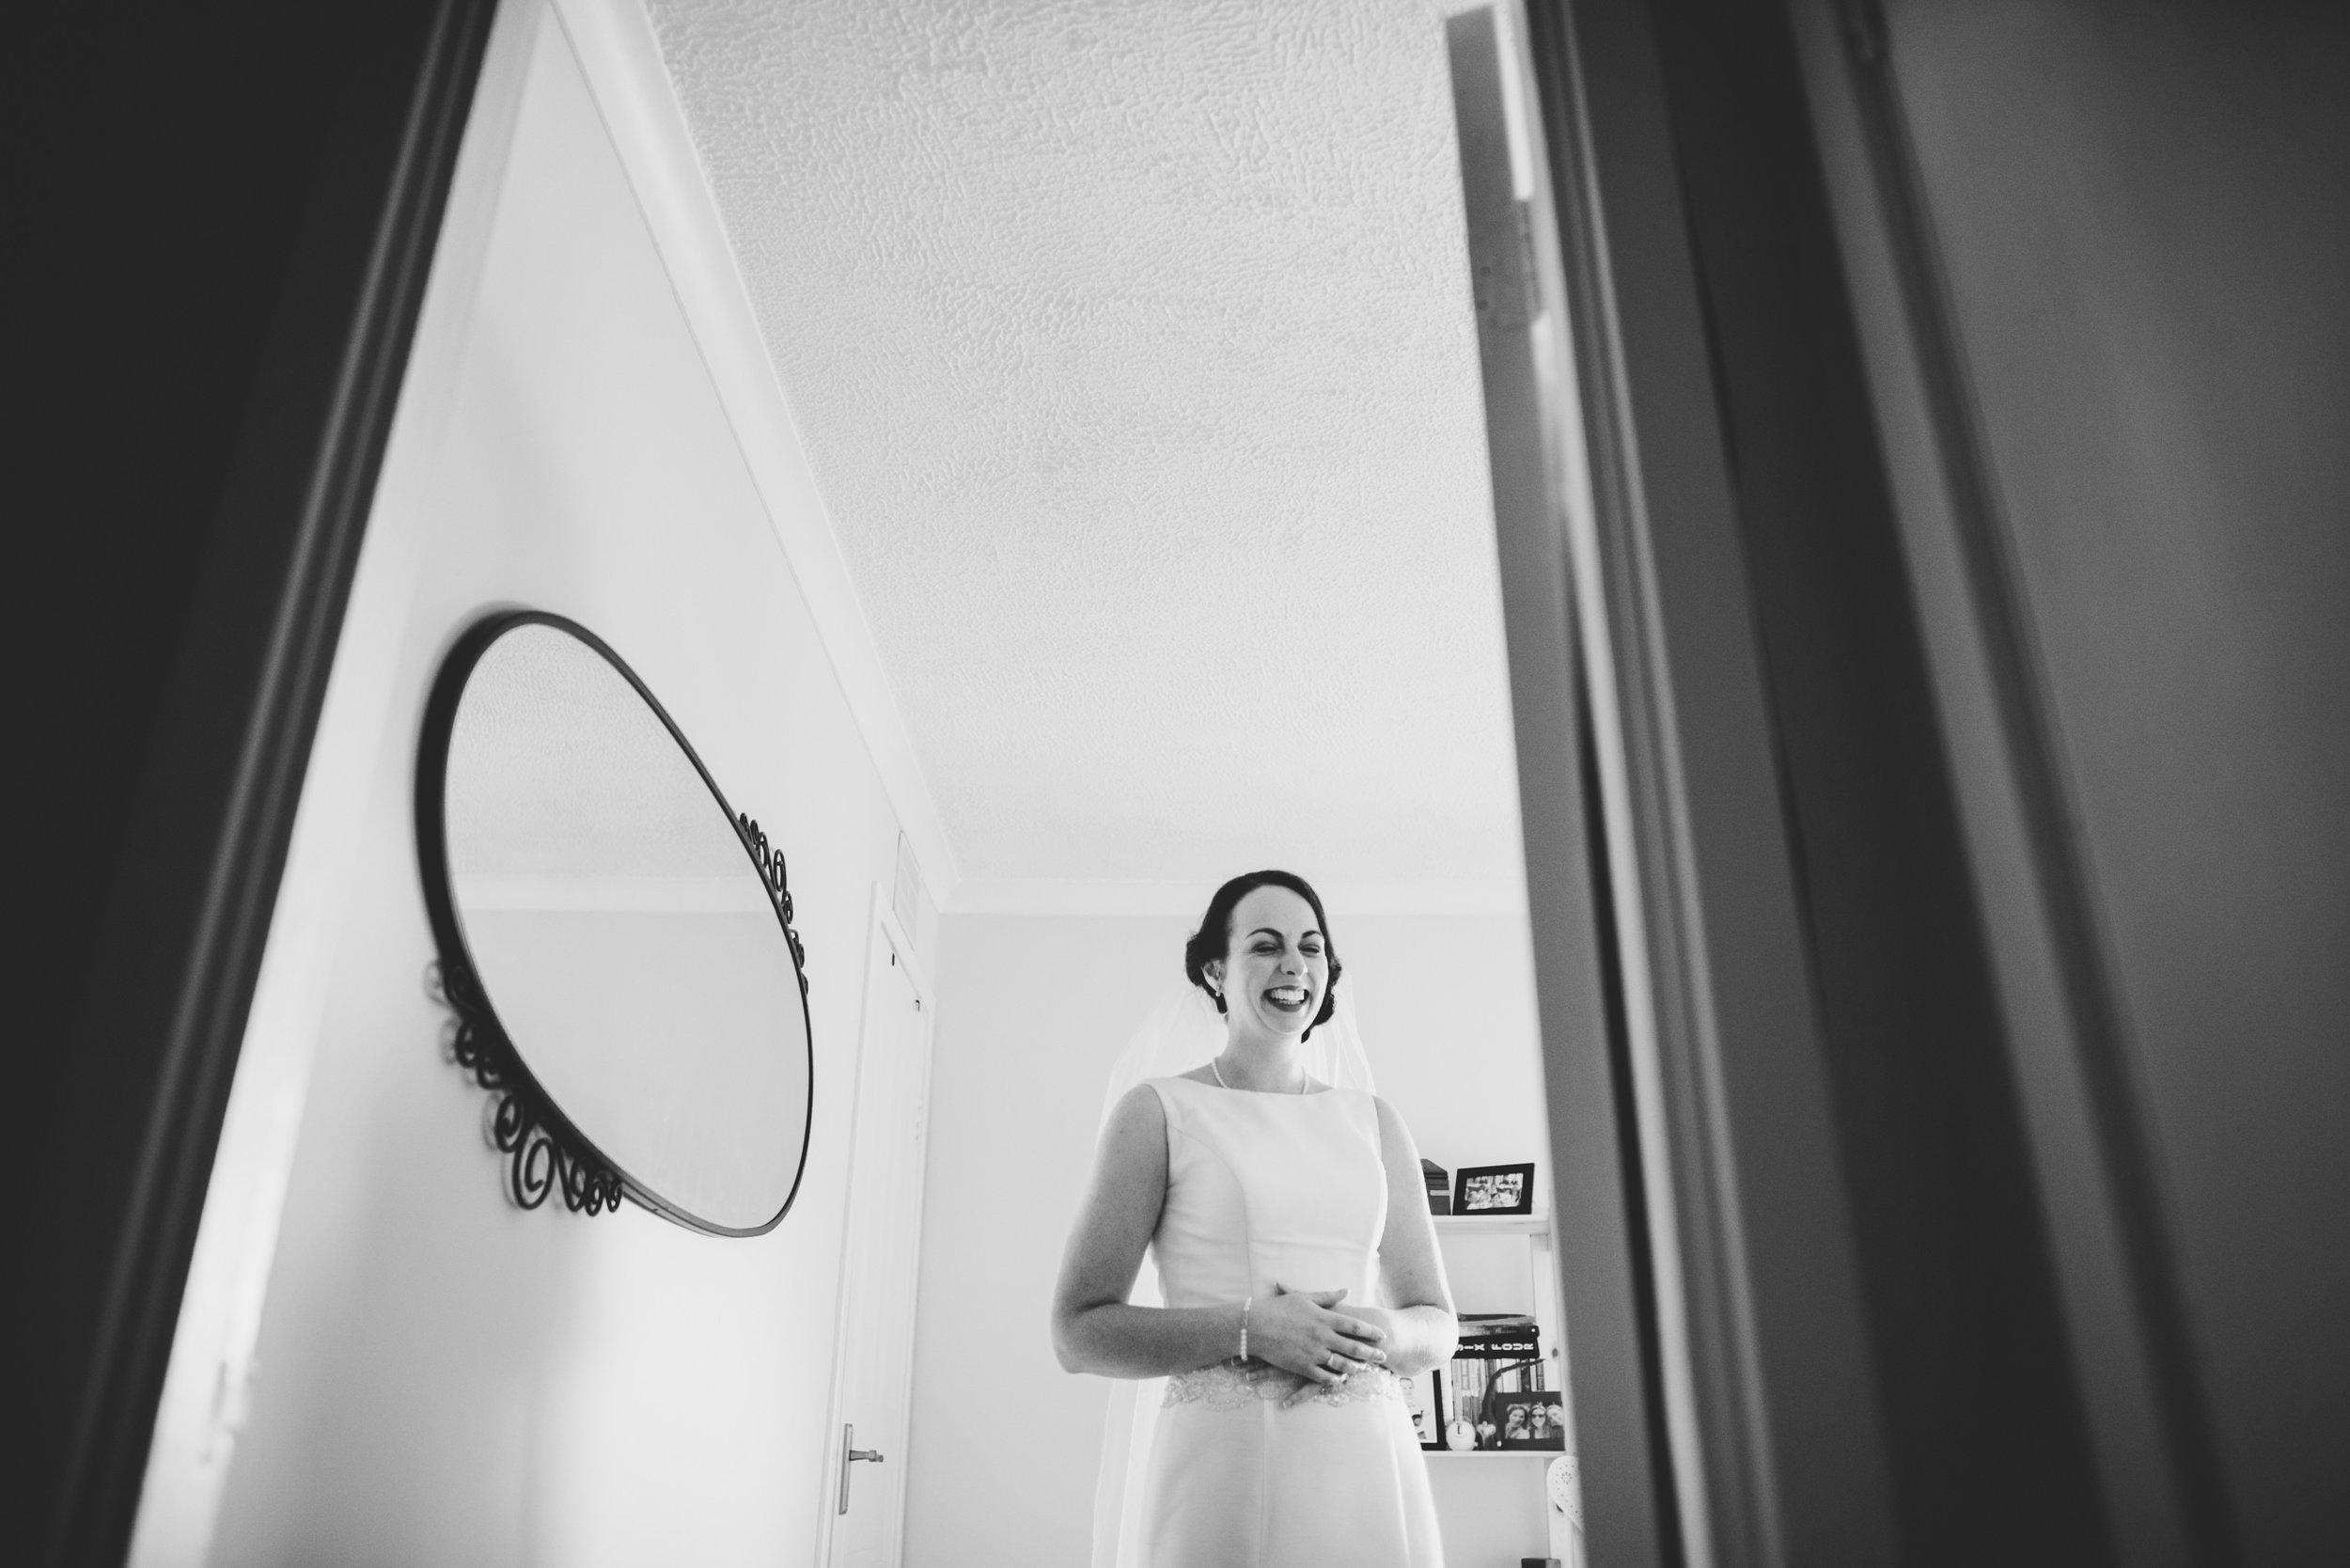 0095-LISA-DEVINE-PHOTOGRAPHY-ALTERNATIVE-WEDDING-PHOTOGRAPHY-SCOTLAND-DESTINATION-WEDDINGS-GLASGOW-WEDDINGS-COOL-WEDDINGS-STYLISH-WEDDINGS.JPG